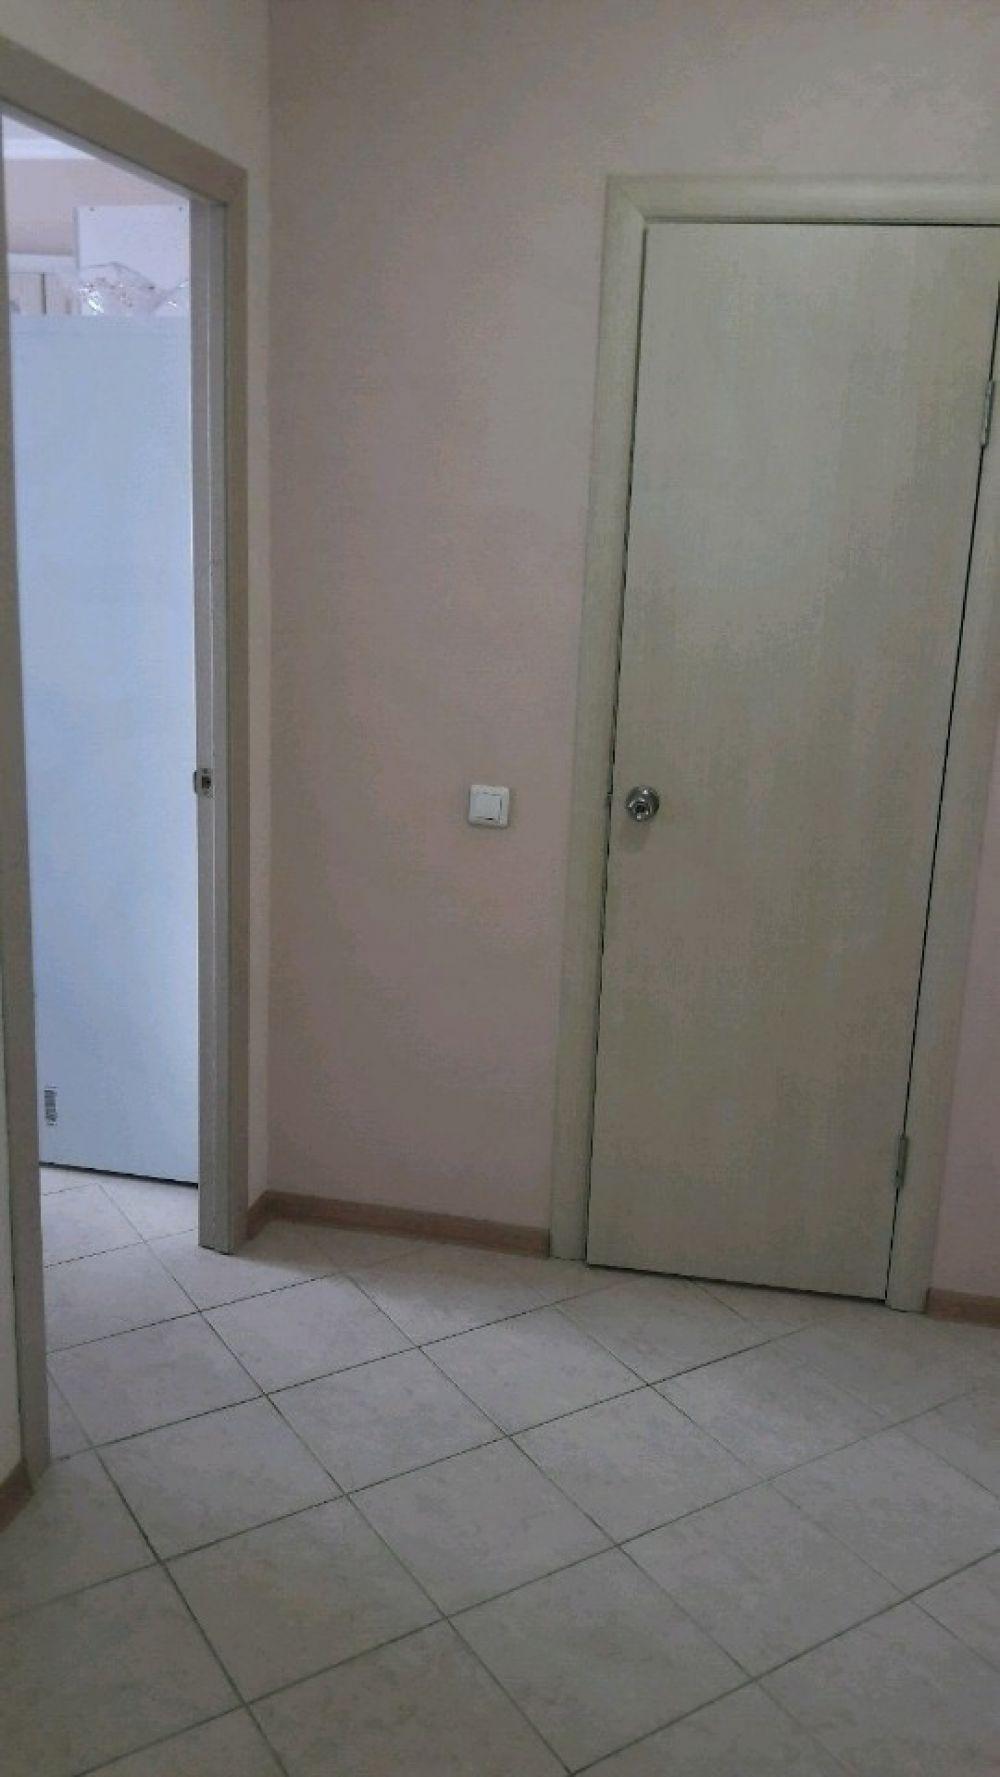 1-к квартира, 41 м2, 7/17 эт. Щёлково, Фряновское шоссе, фото 4